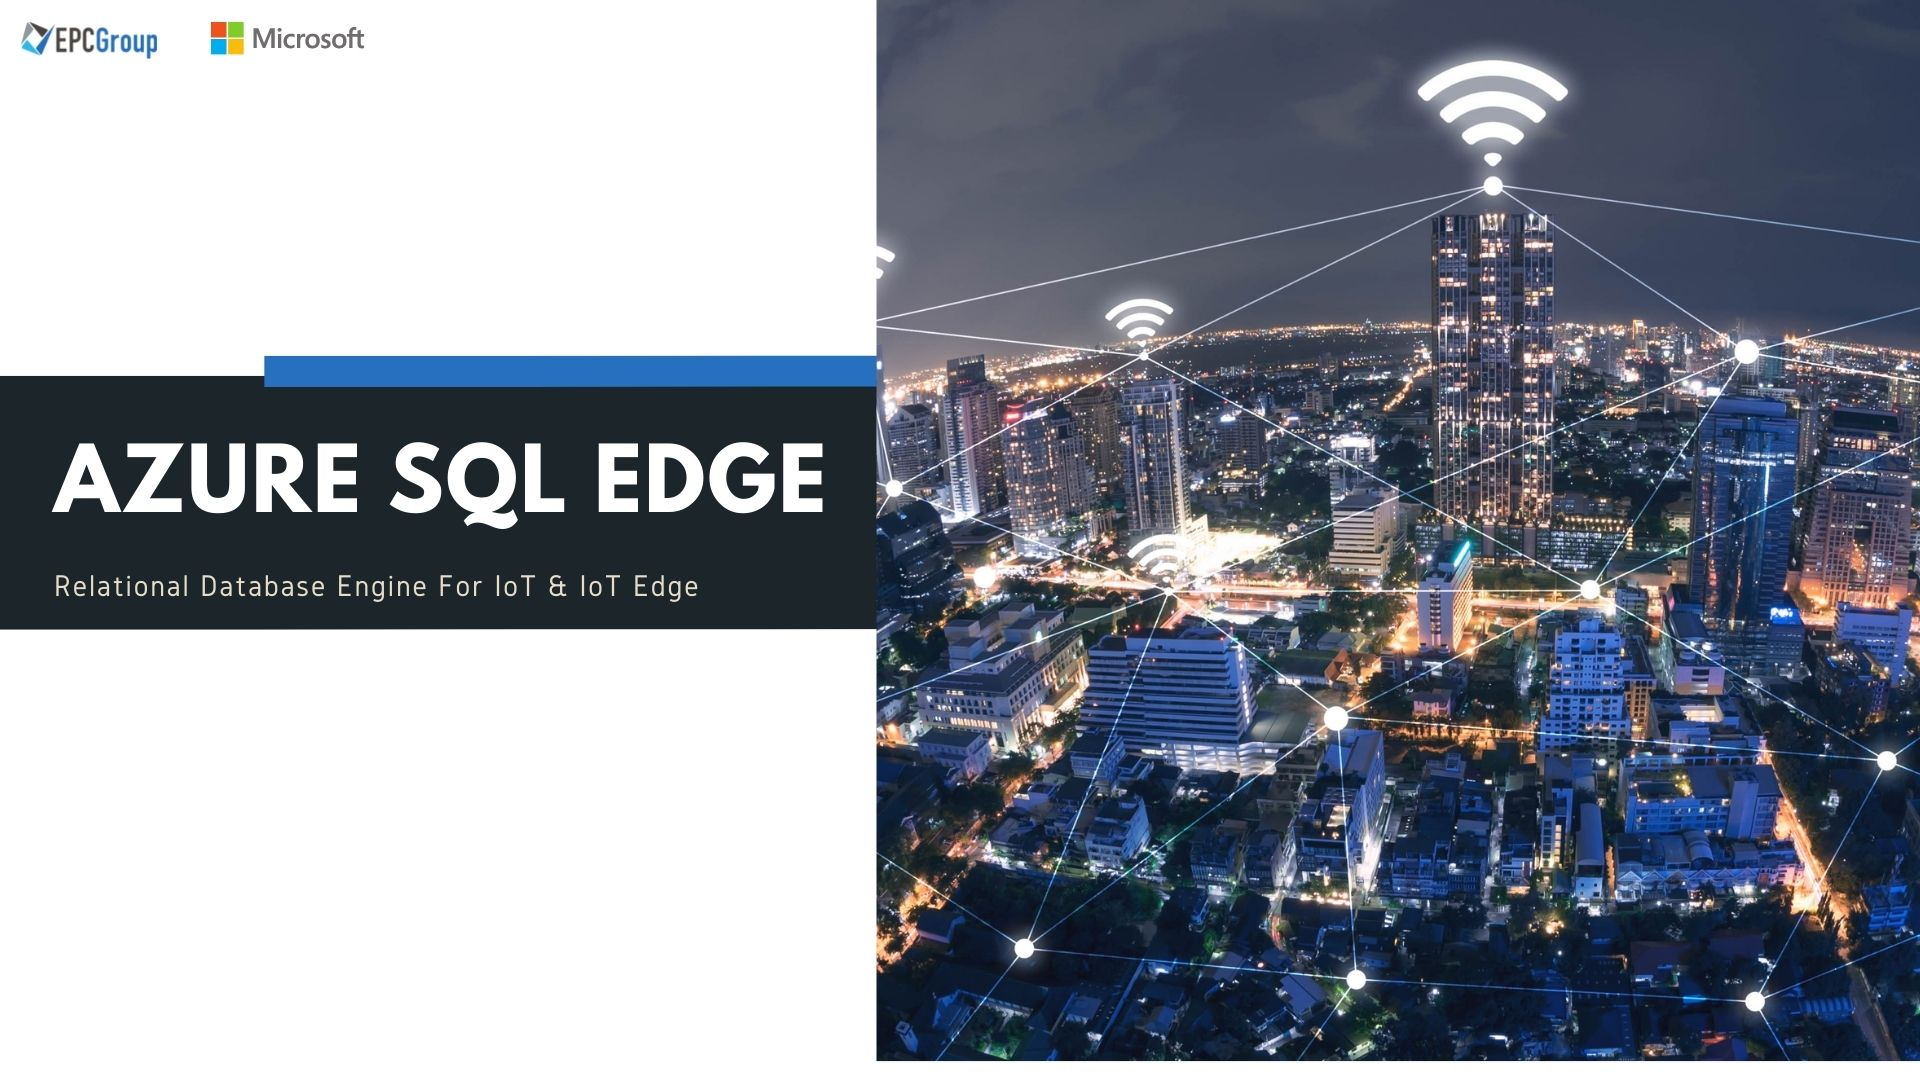 Microsoft Azure SQL Edge: Relational Database Engine Geared For IoT & IoT Edge Deployments - thumb image